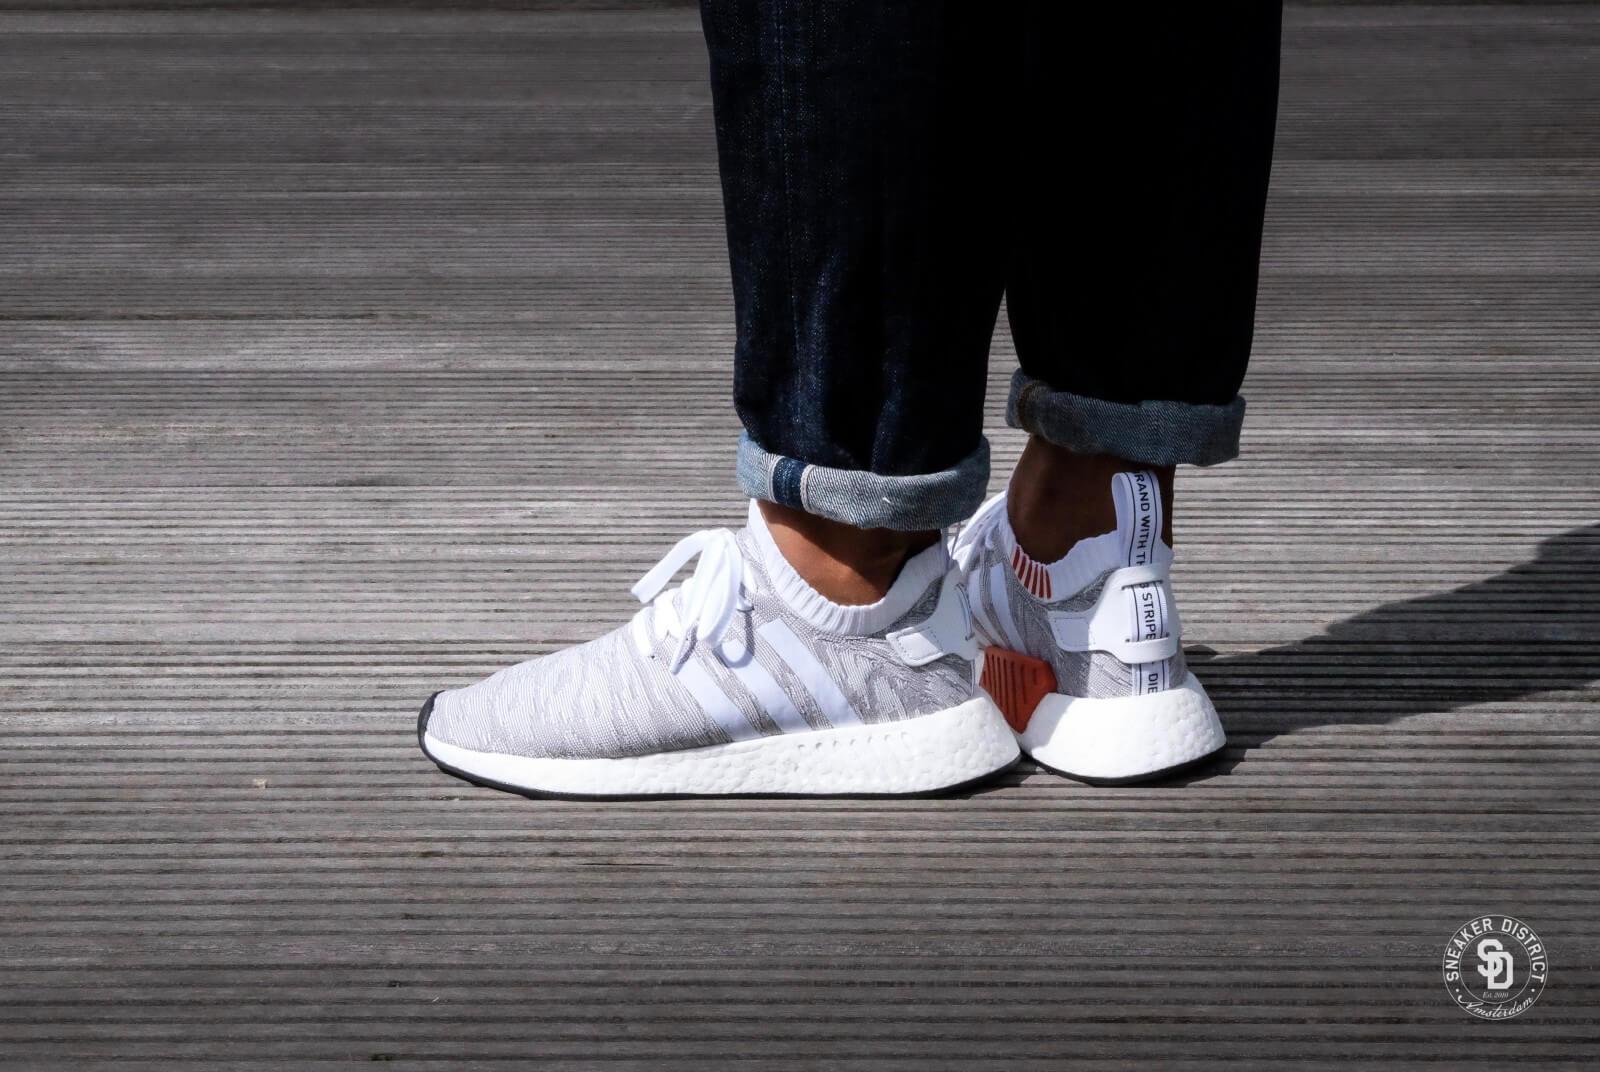 Adidas NMD R2 PK Footwear White / Core